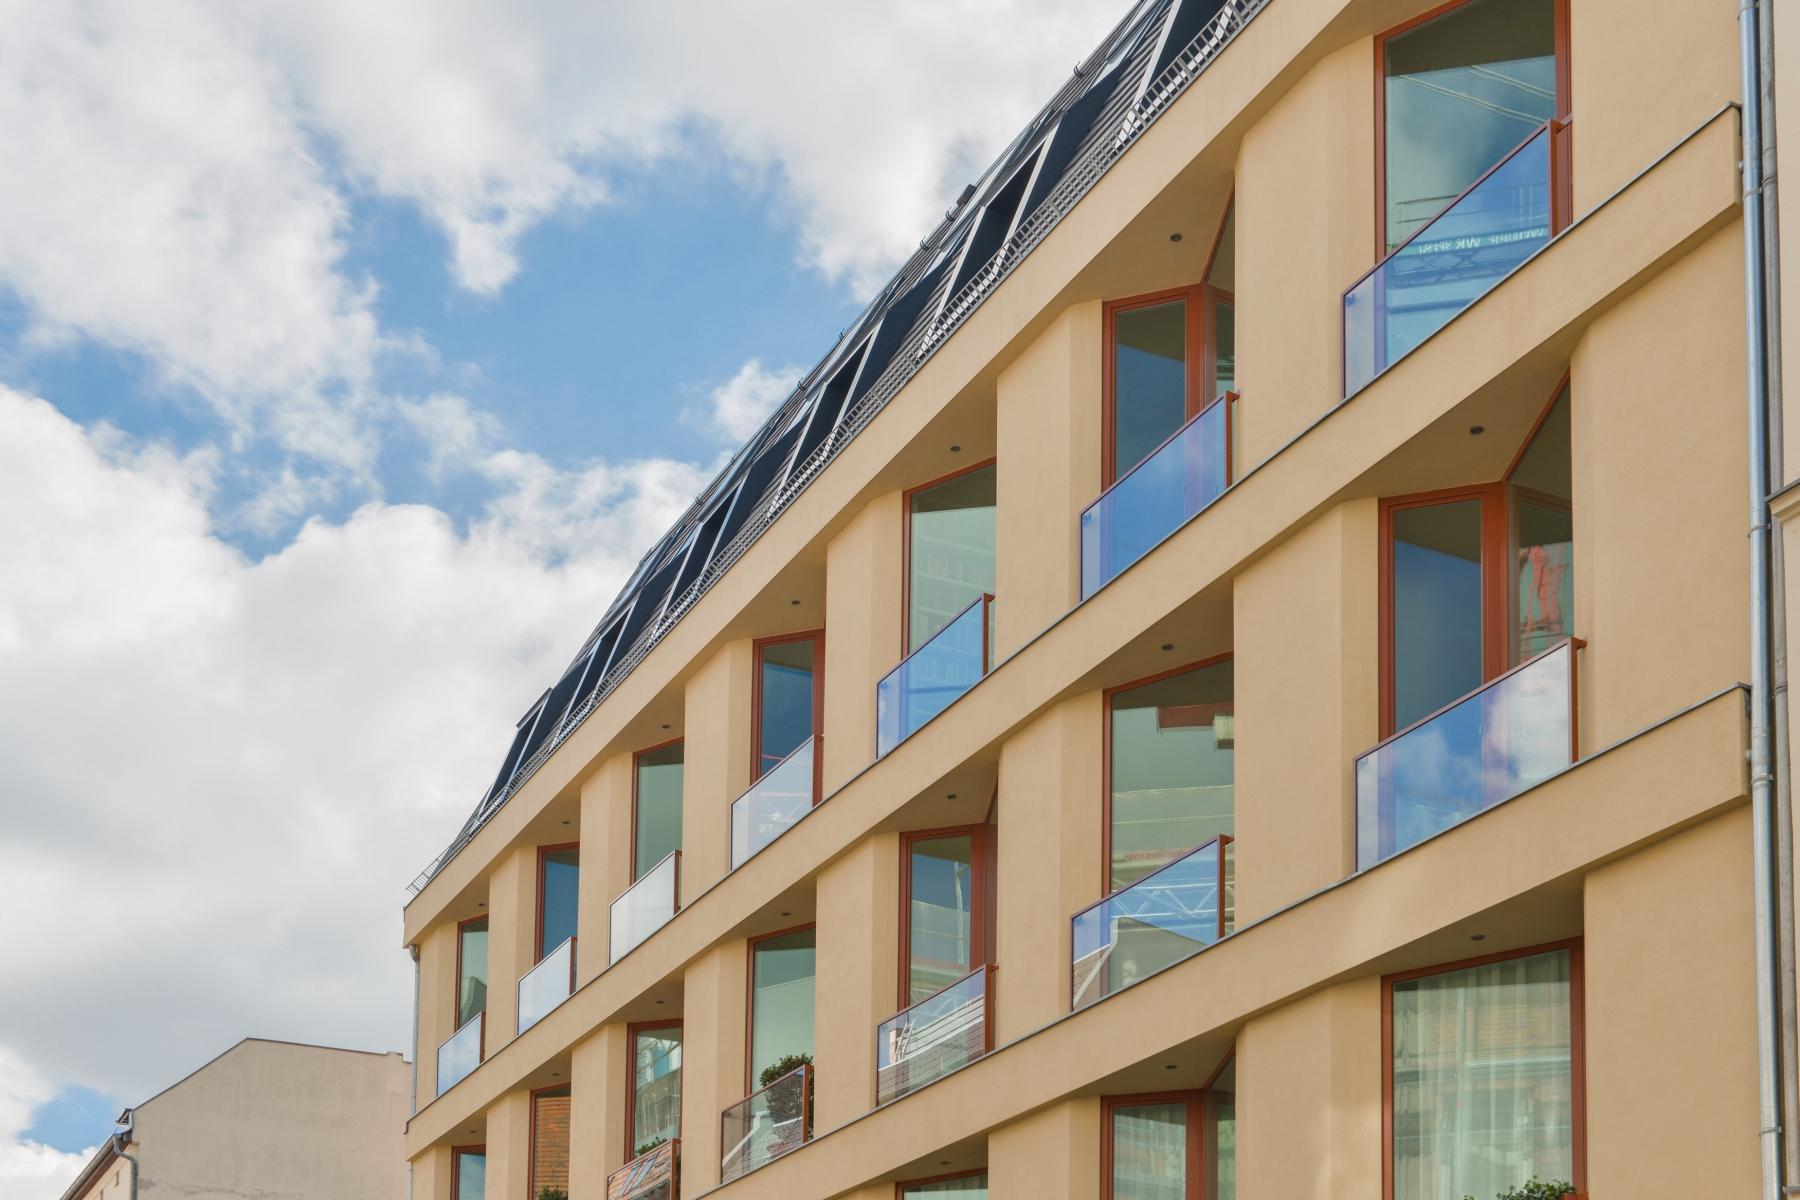 Dúplex por un Venta en Fantastic Penthouse Duplex with Terrace and Rooftop Terrace! Berlin, Berlin, 10115 Alemania